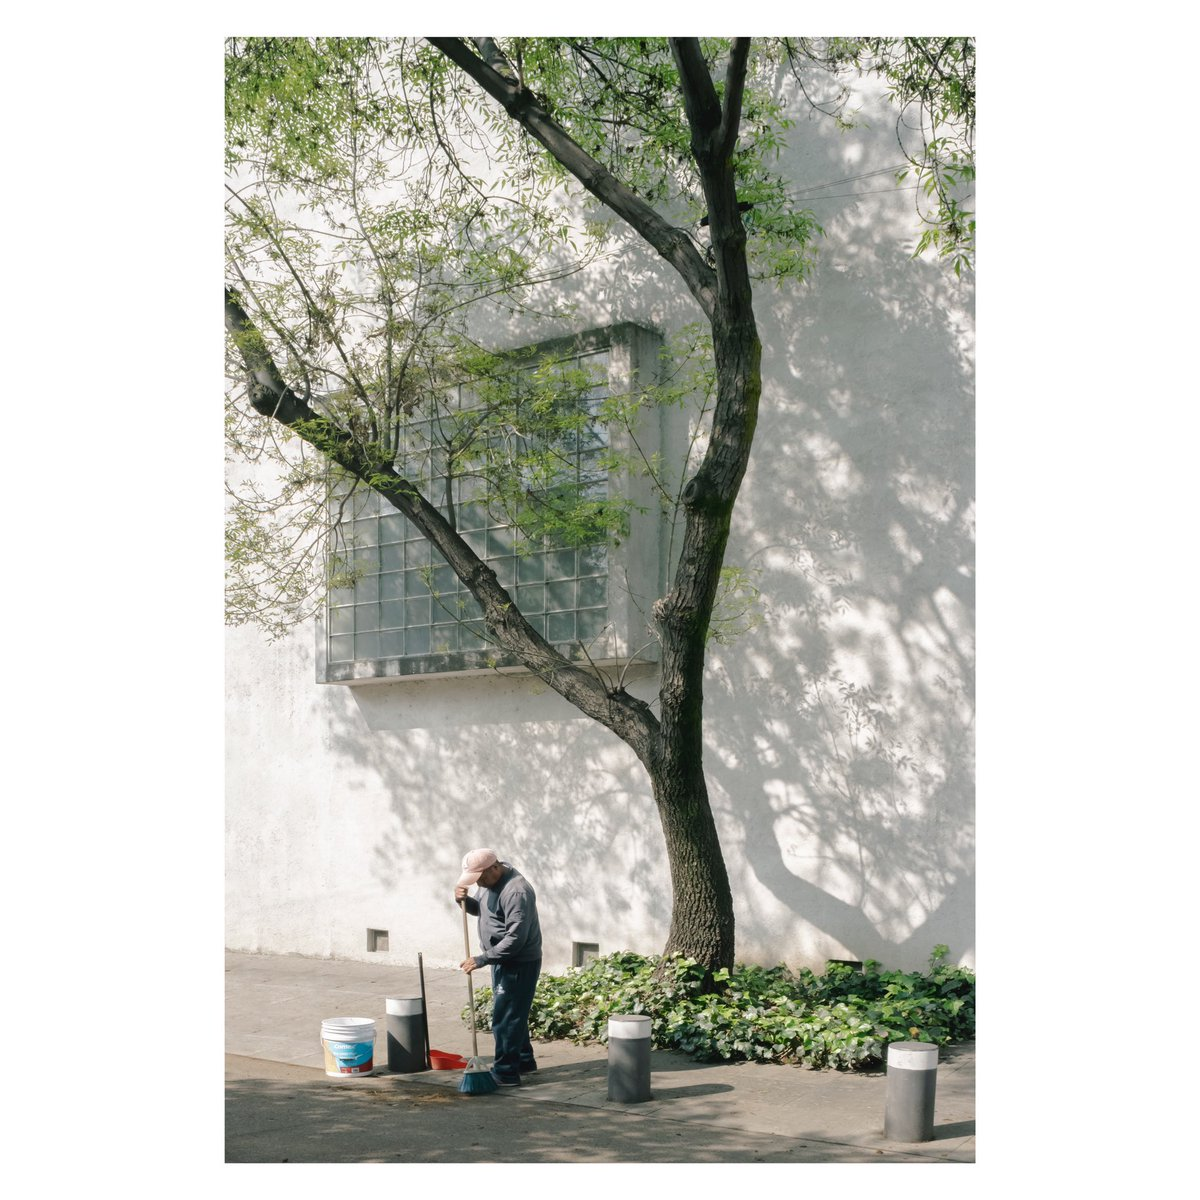 """#Stayhome and let the light come in.""   Casa Estudio Luis Barragàn | 1948 | Mexico City, MX  #LuisBarragàn #CasaEstudioLuisBarragàn #MexicanArchitecture pic.twitter.com/O1EUaIaPzd"